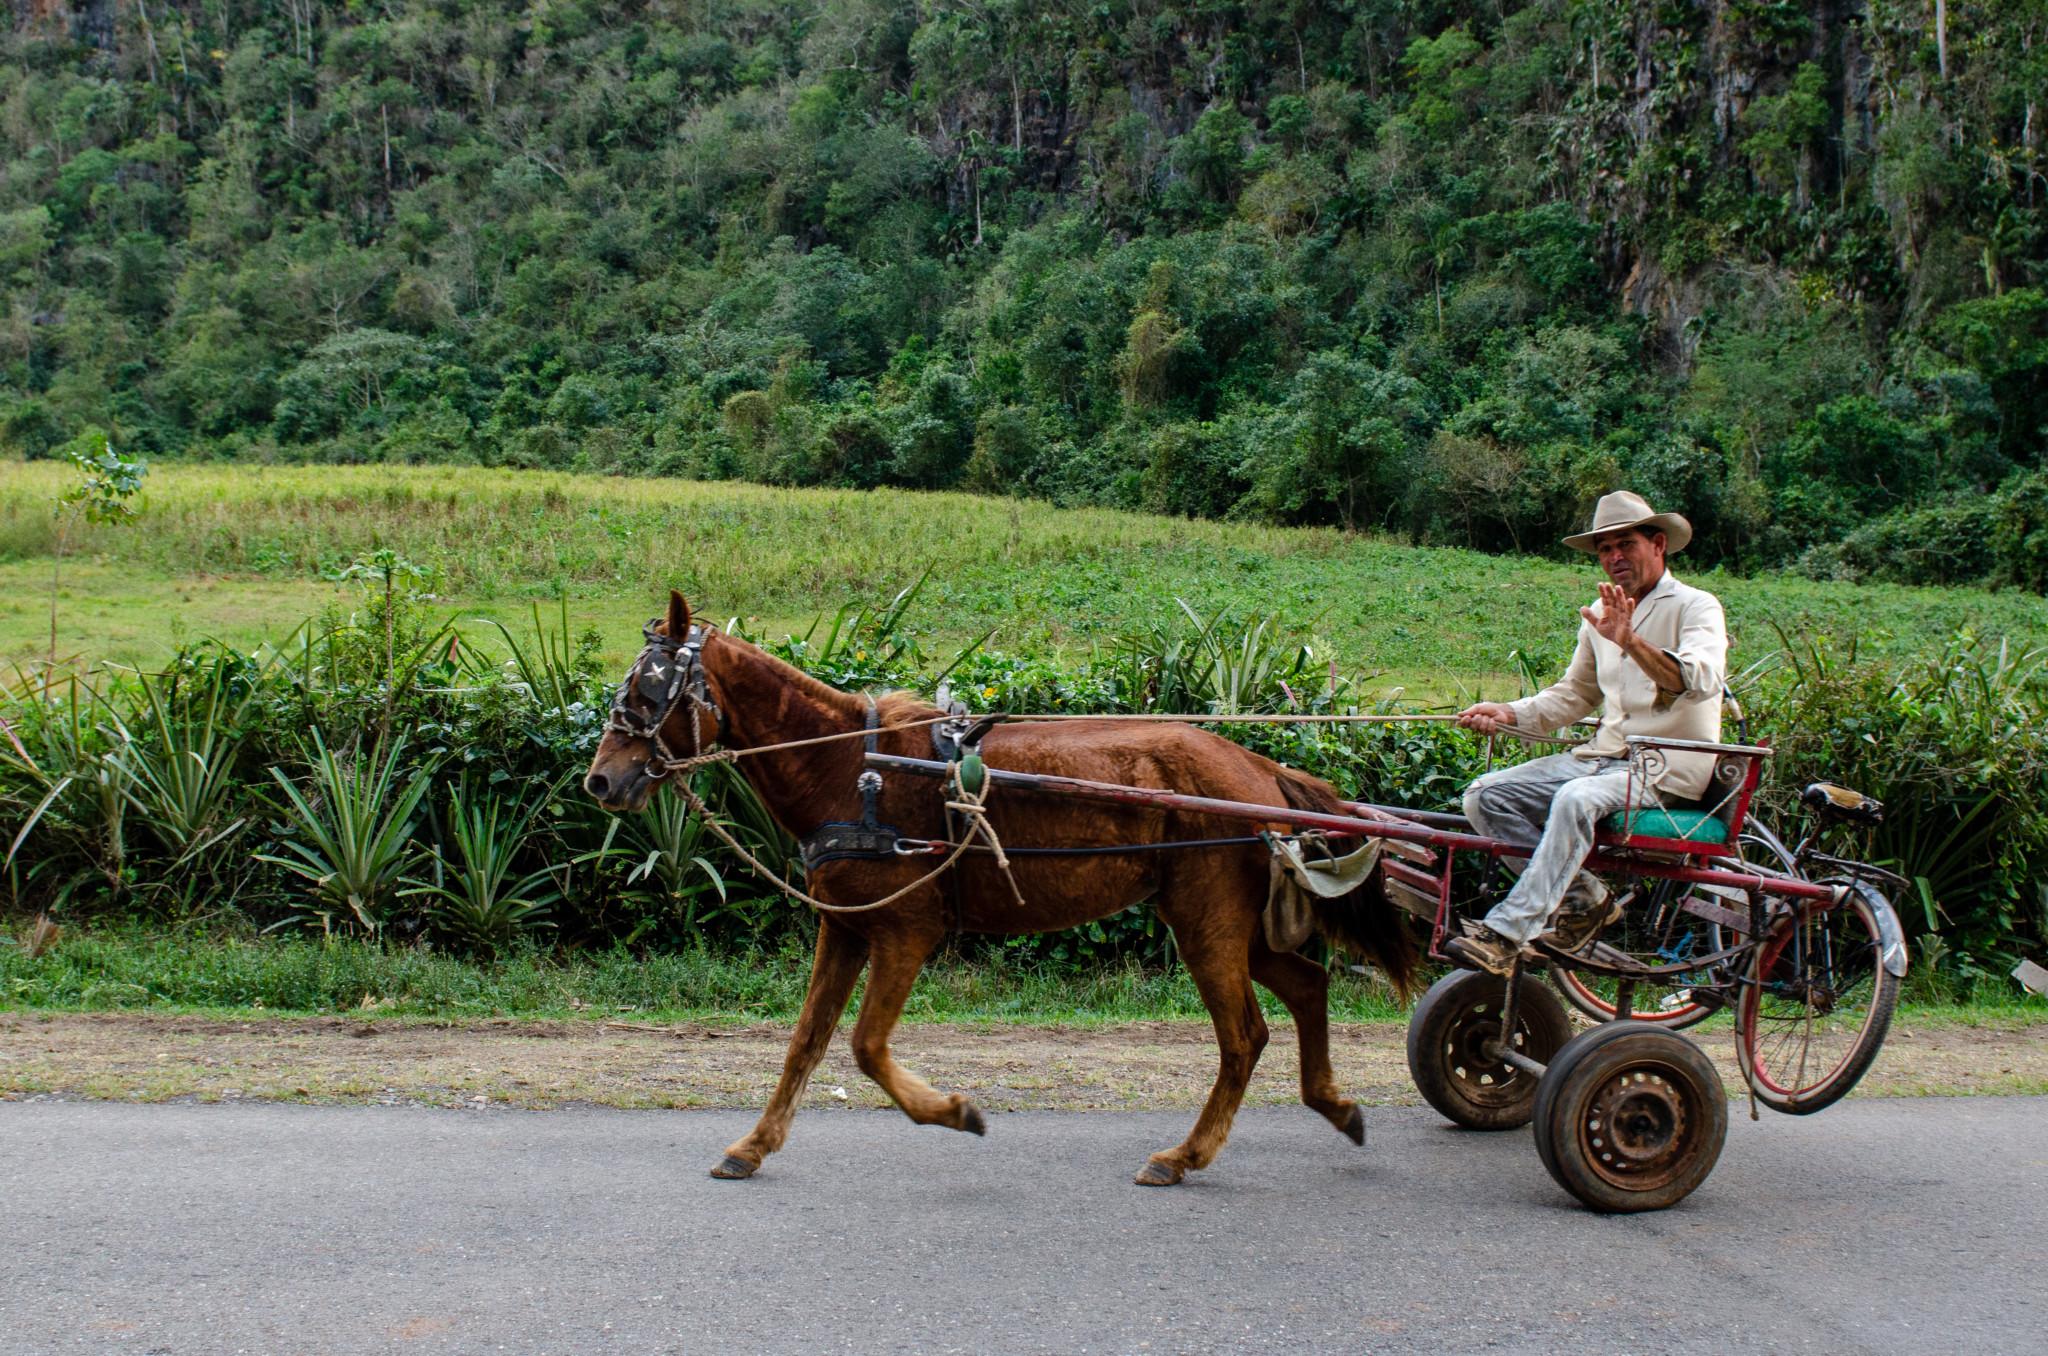 Anreise nach Kuba: Infos in unseren Kuba Reisetipps